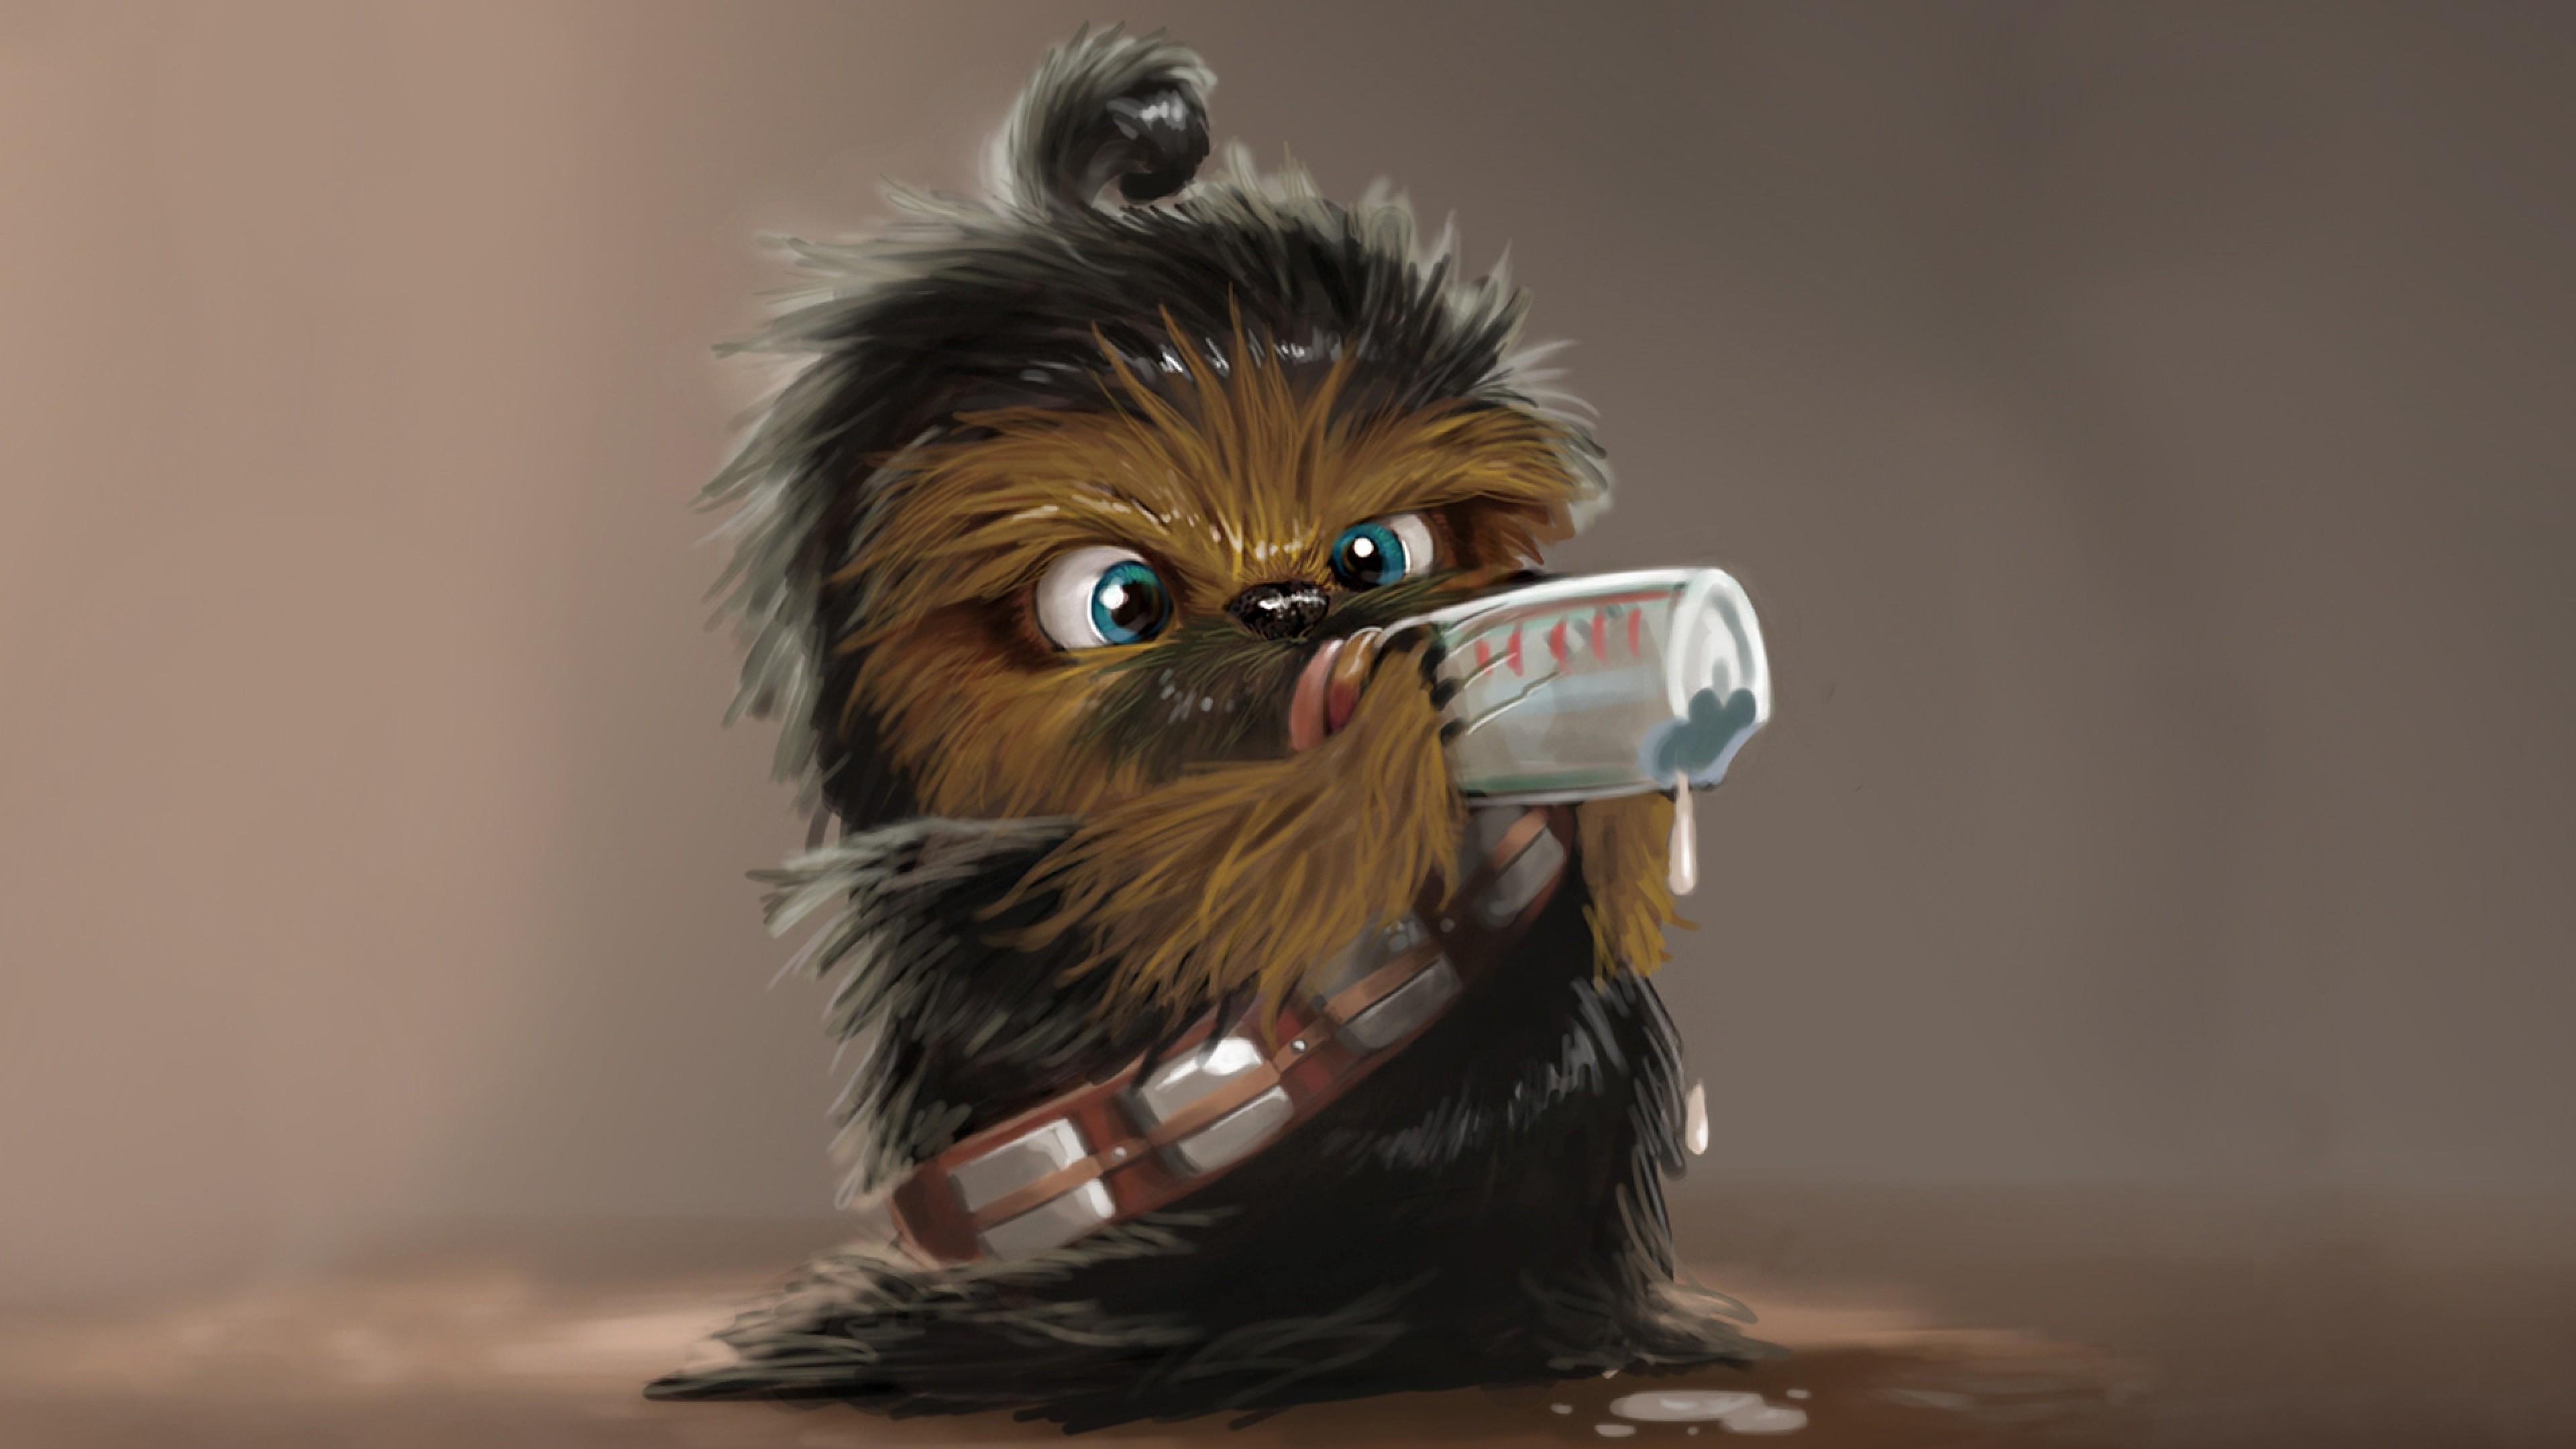 Star wars, Chewbacca, Drink, Baby Wallpaper, Background 4K Ultra .